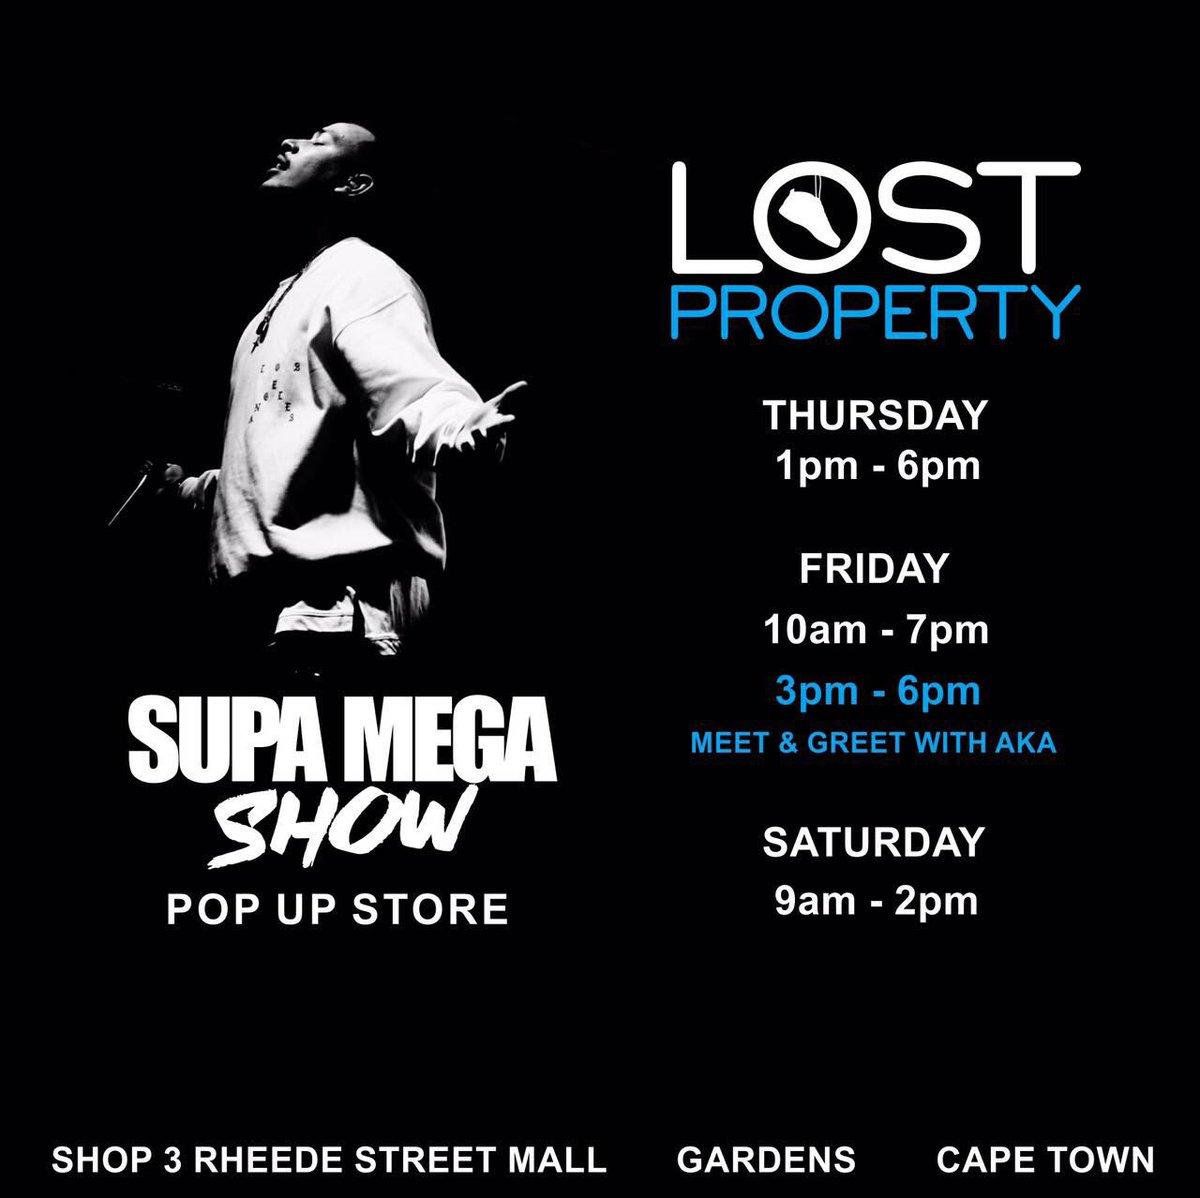 The OFFICIAL store times for the SUPA MEGA SHOW pop up store Ⓜ️ #MegaStayFreshSept17 https://t.co/sKw14Q3KEK